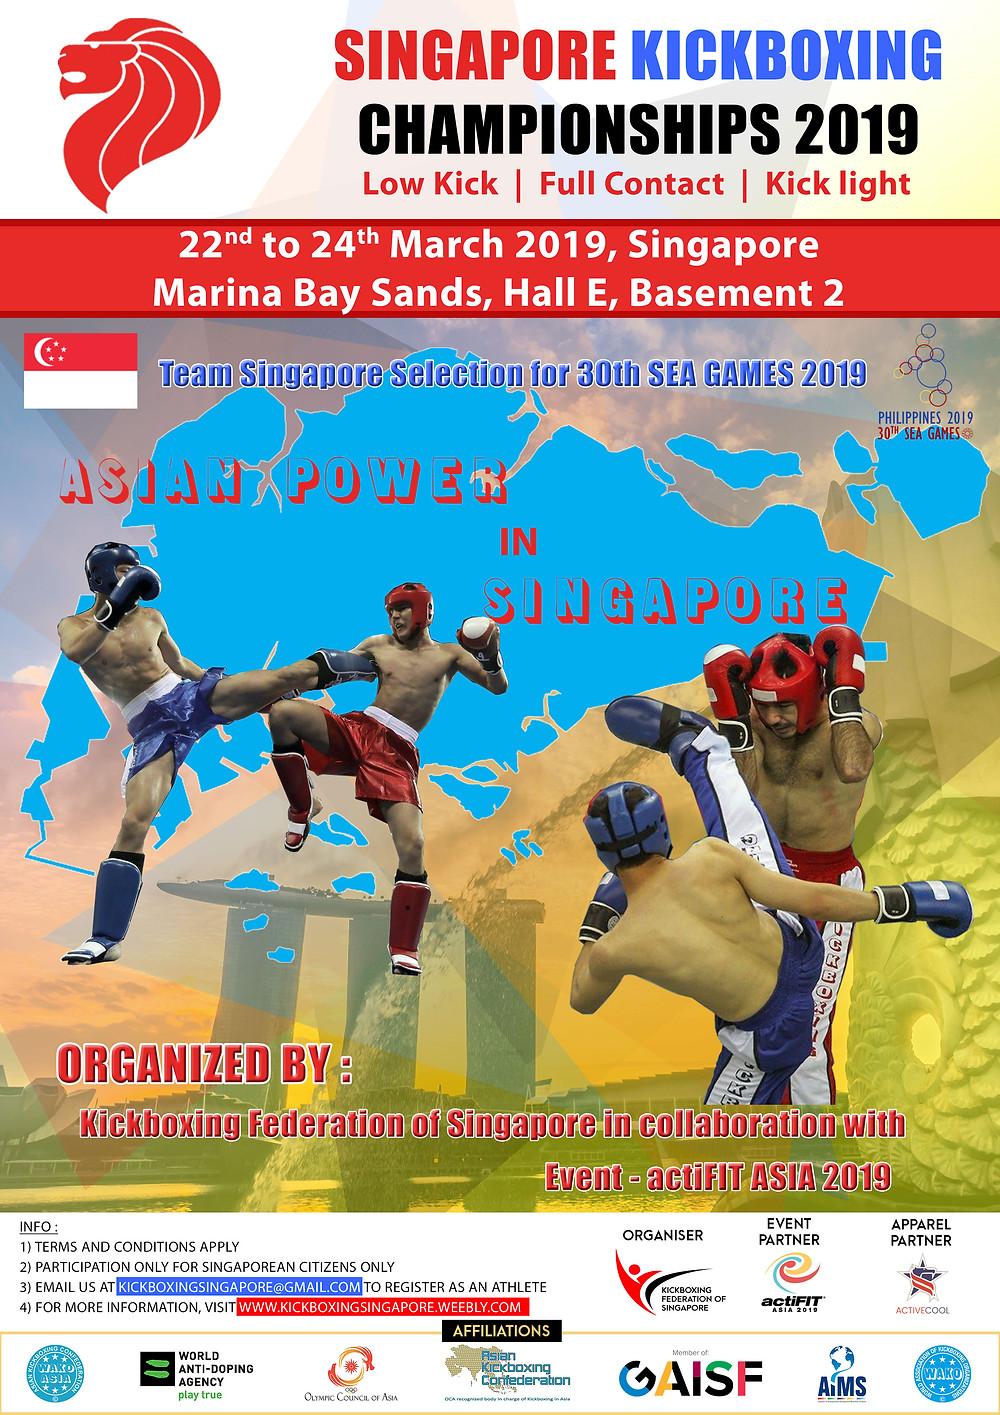 Singapore Kickboxing Championships 2019